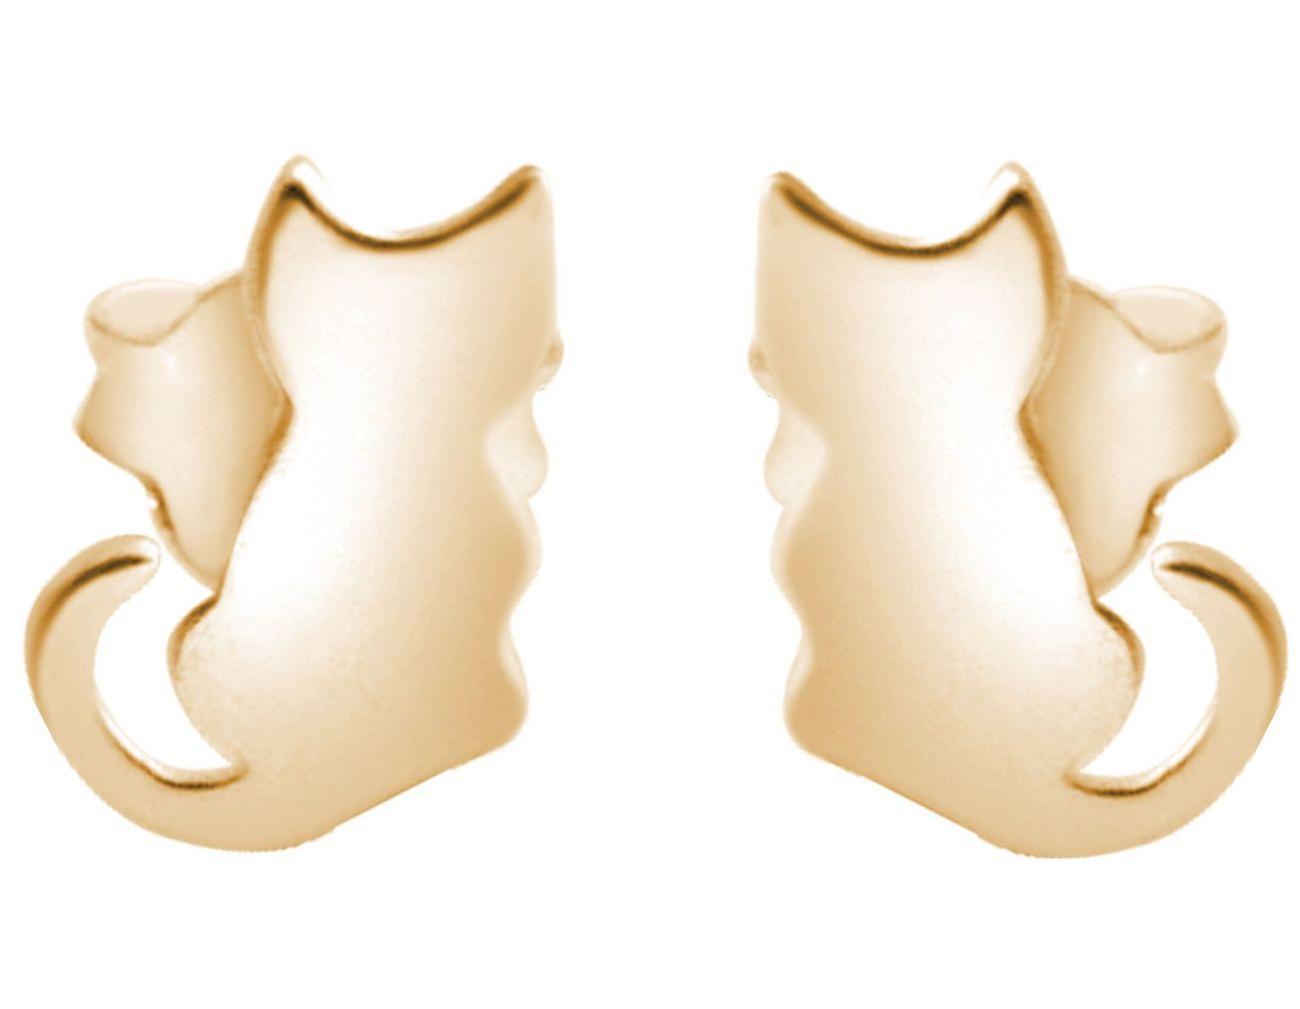 GEMSHINE Ohrstecker Katze oder Kätzchen 925 Silber, vergoldet oder rose